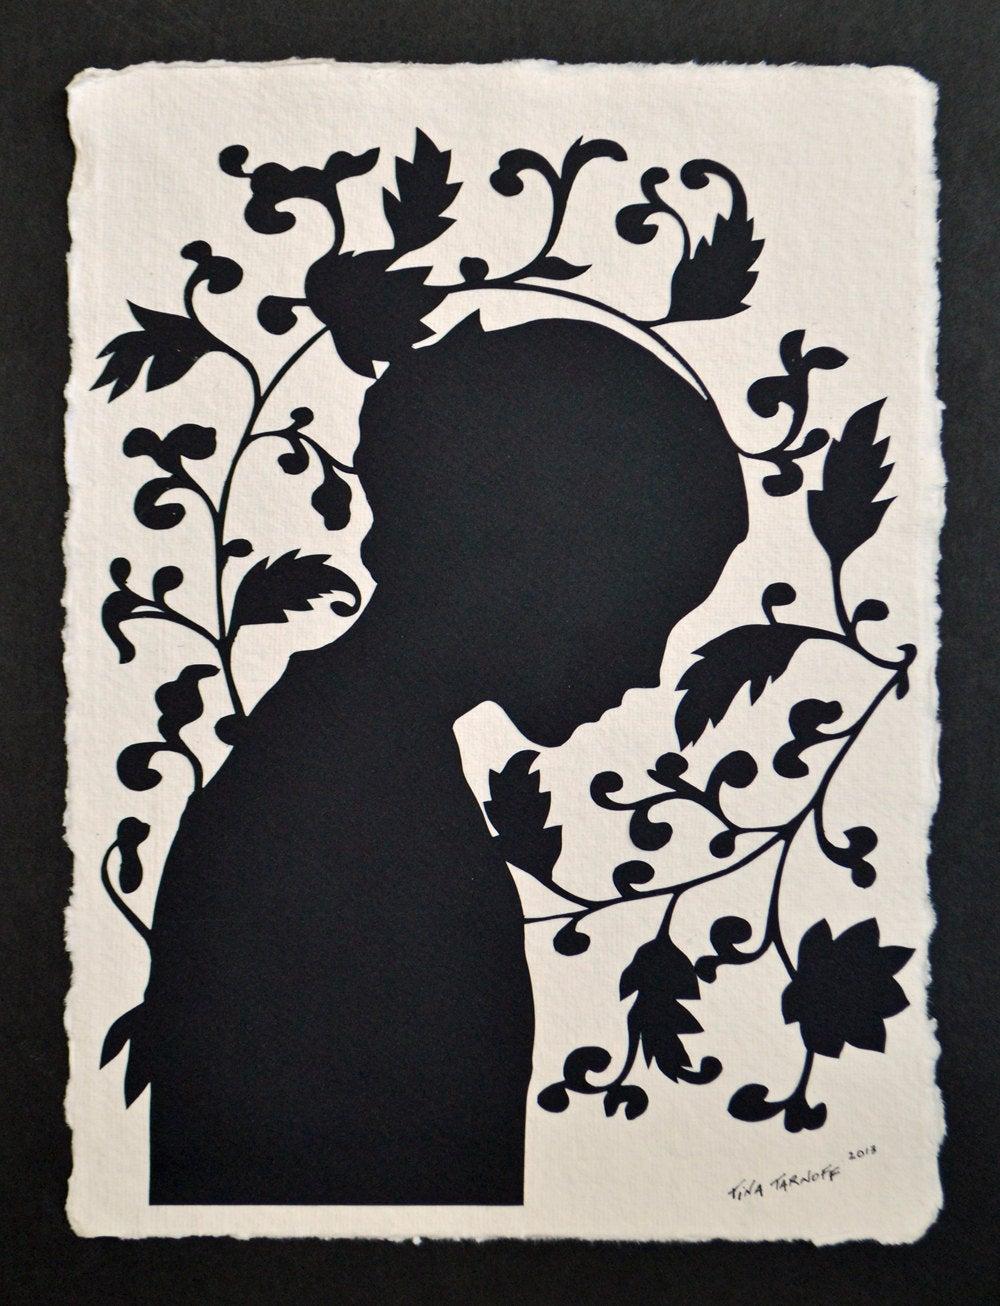 JANE EYRE Papercut.